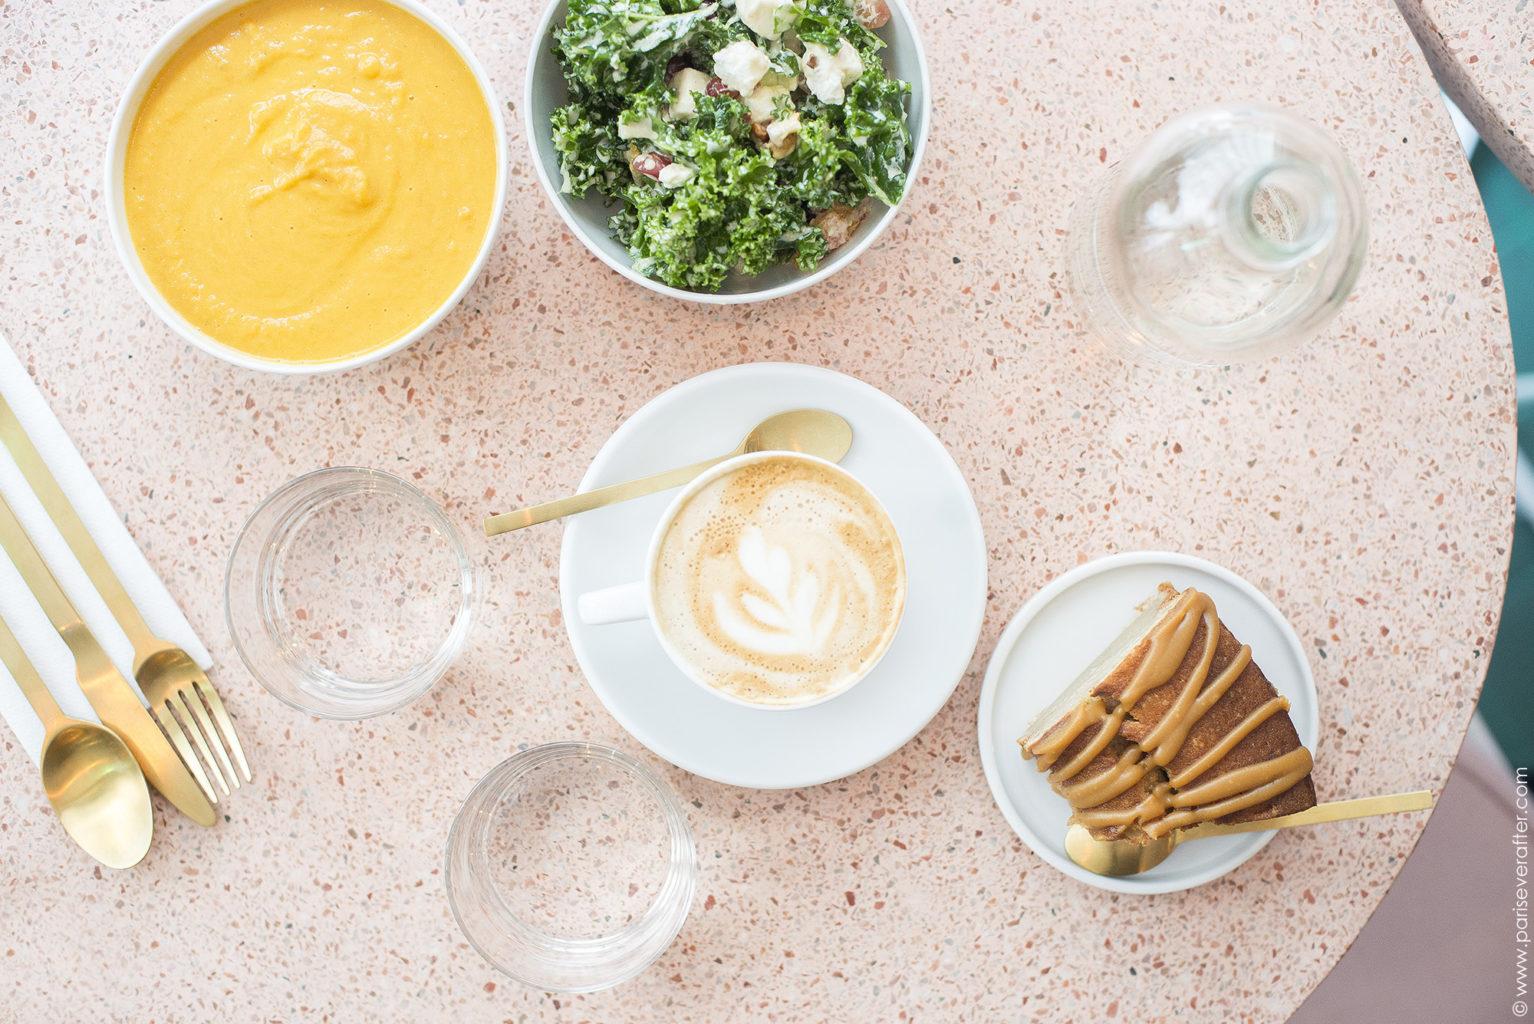 The Prettiest Parisian Café: Peonies